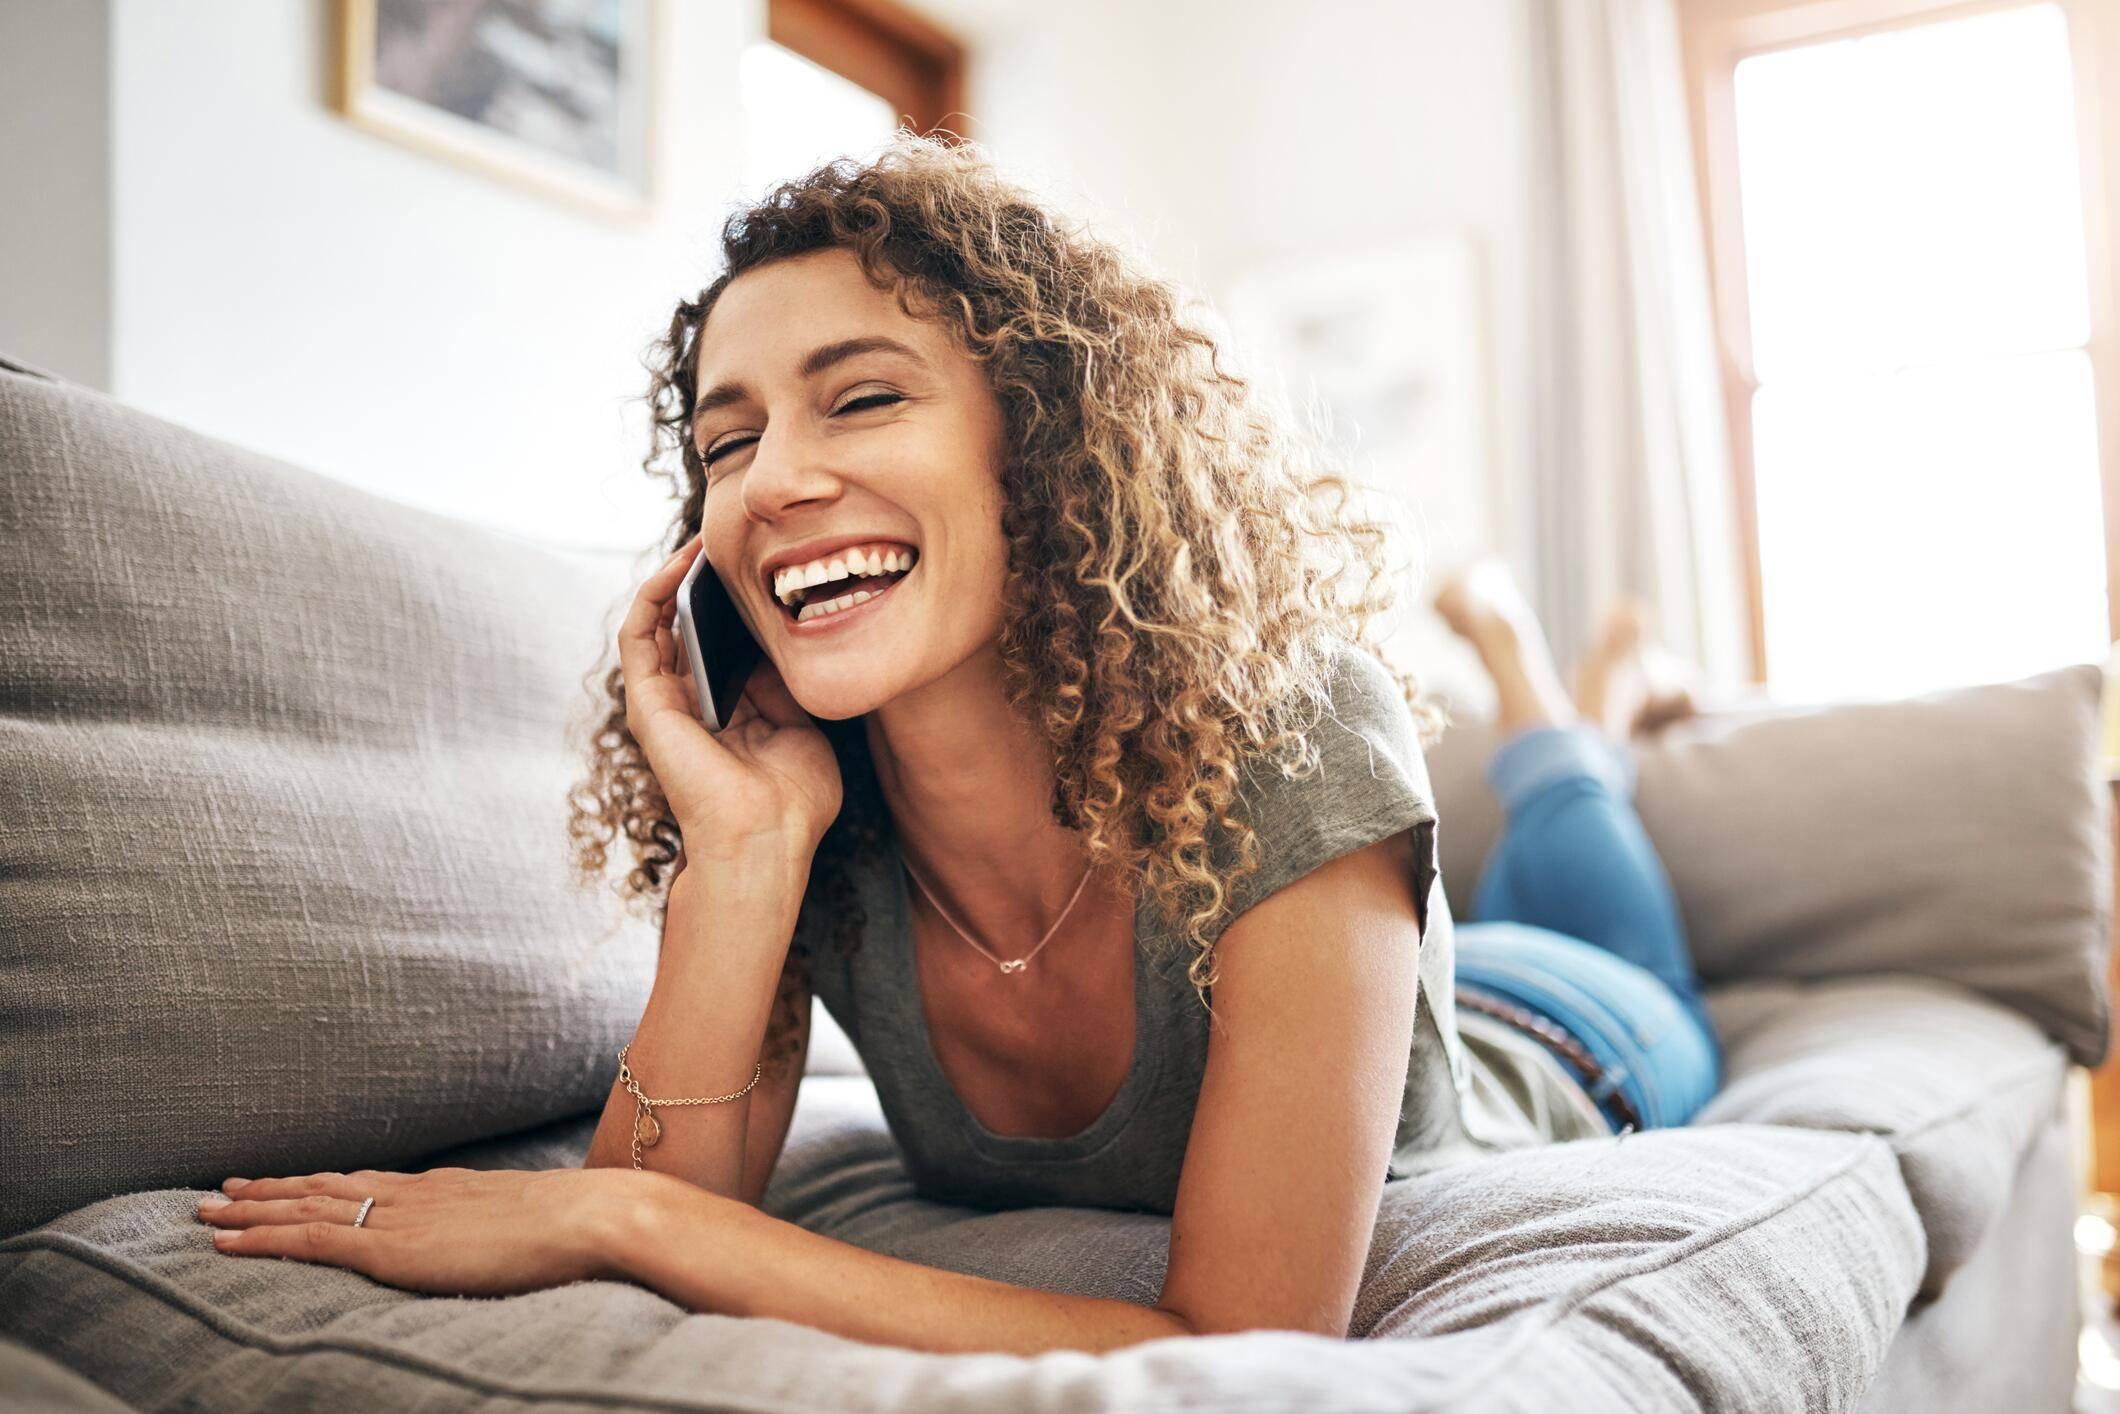 telefonanbieter wechseln und telefon ummelden bei umzug. Black Bedroom Furniture Sets. Home Design Ideas